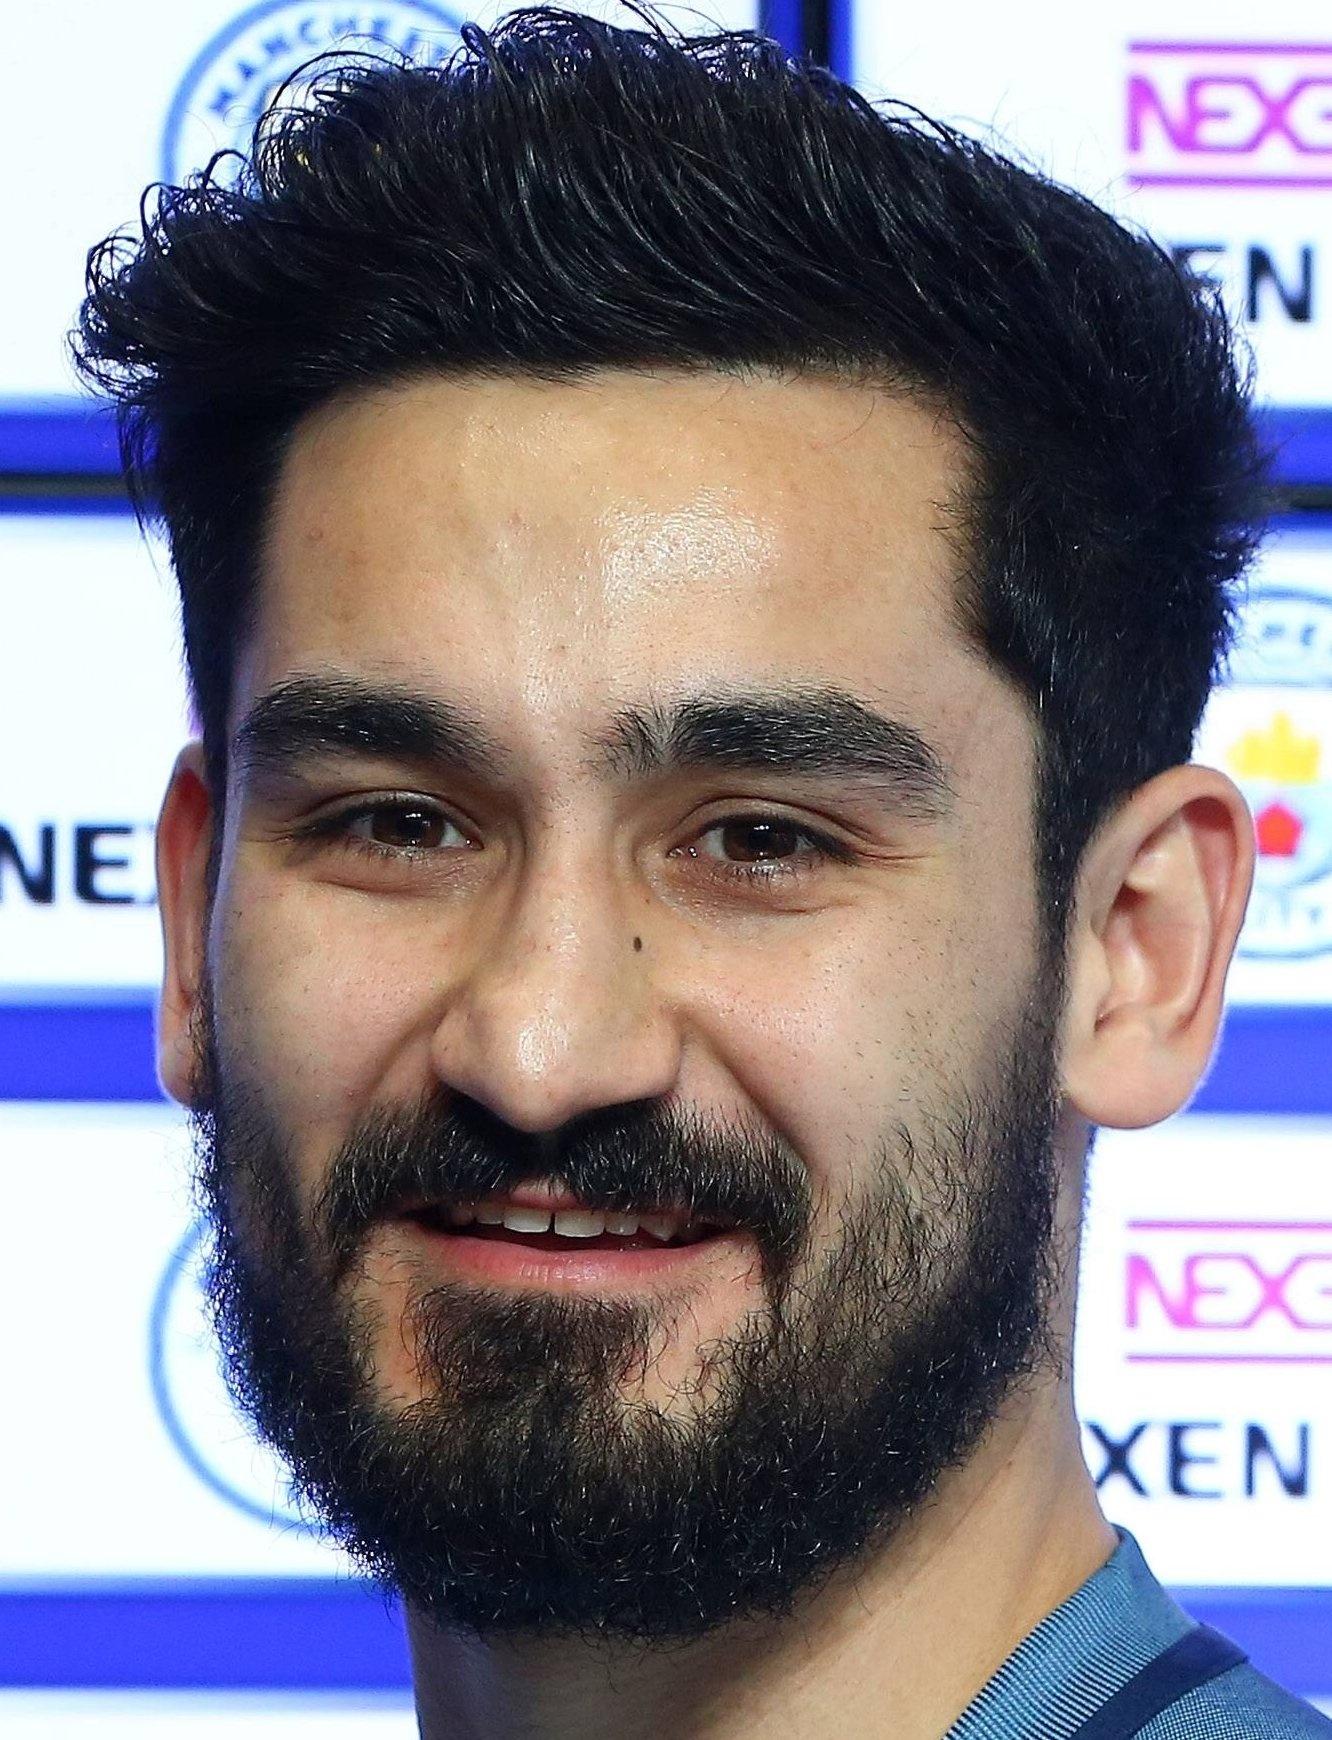 Ilkay Gündogan Player Profile 17 18